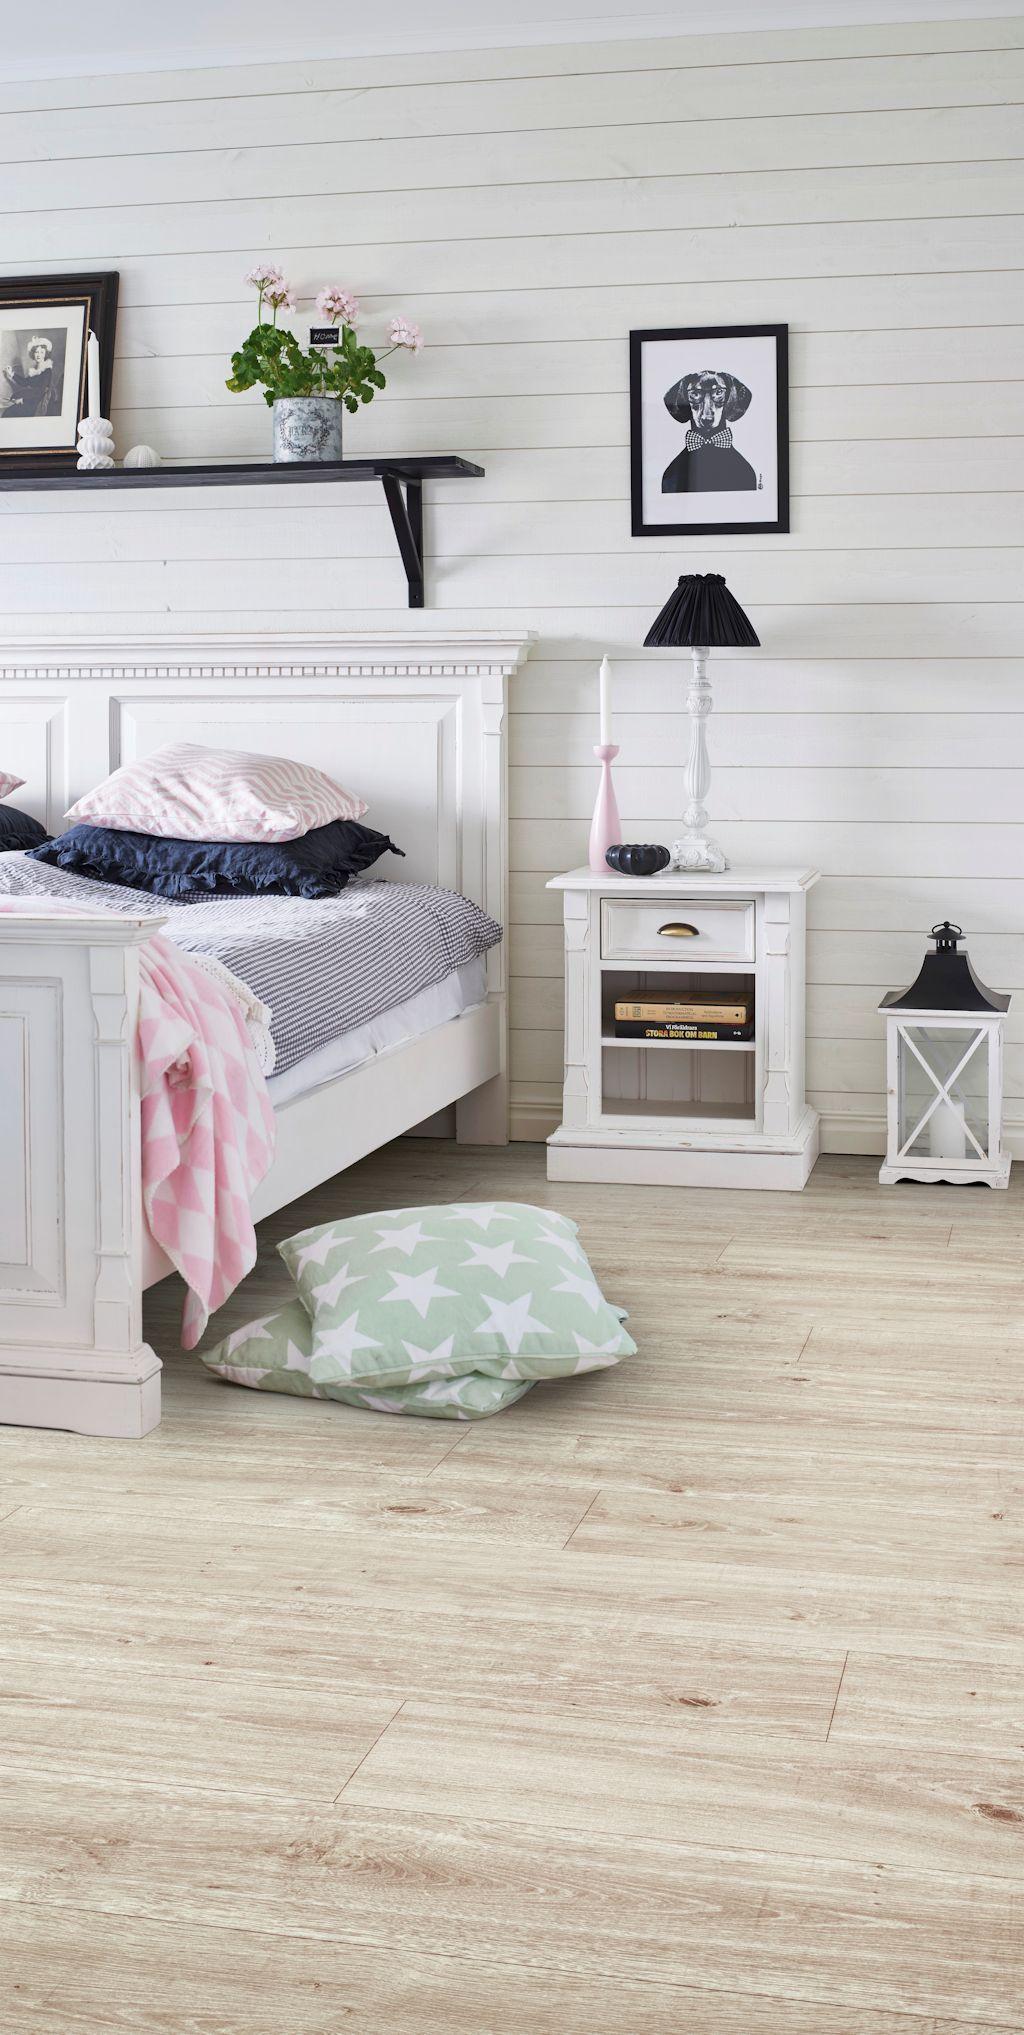 Bedroom featuring Secura PUR luxury vinyl sheet flooring